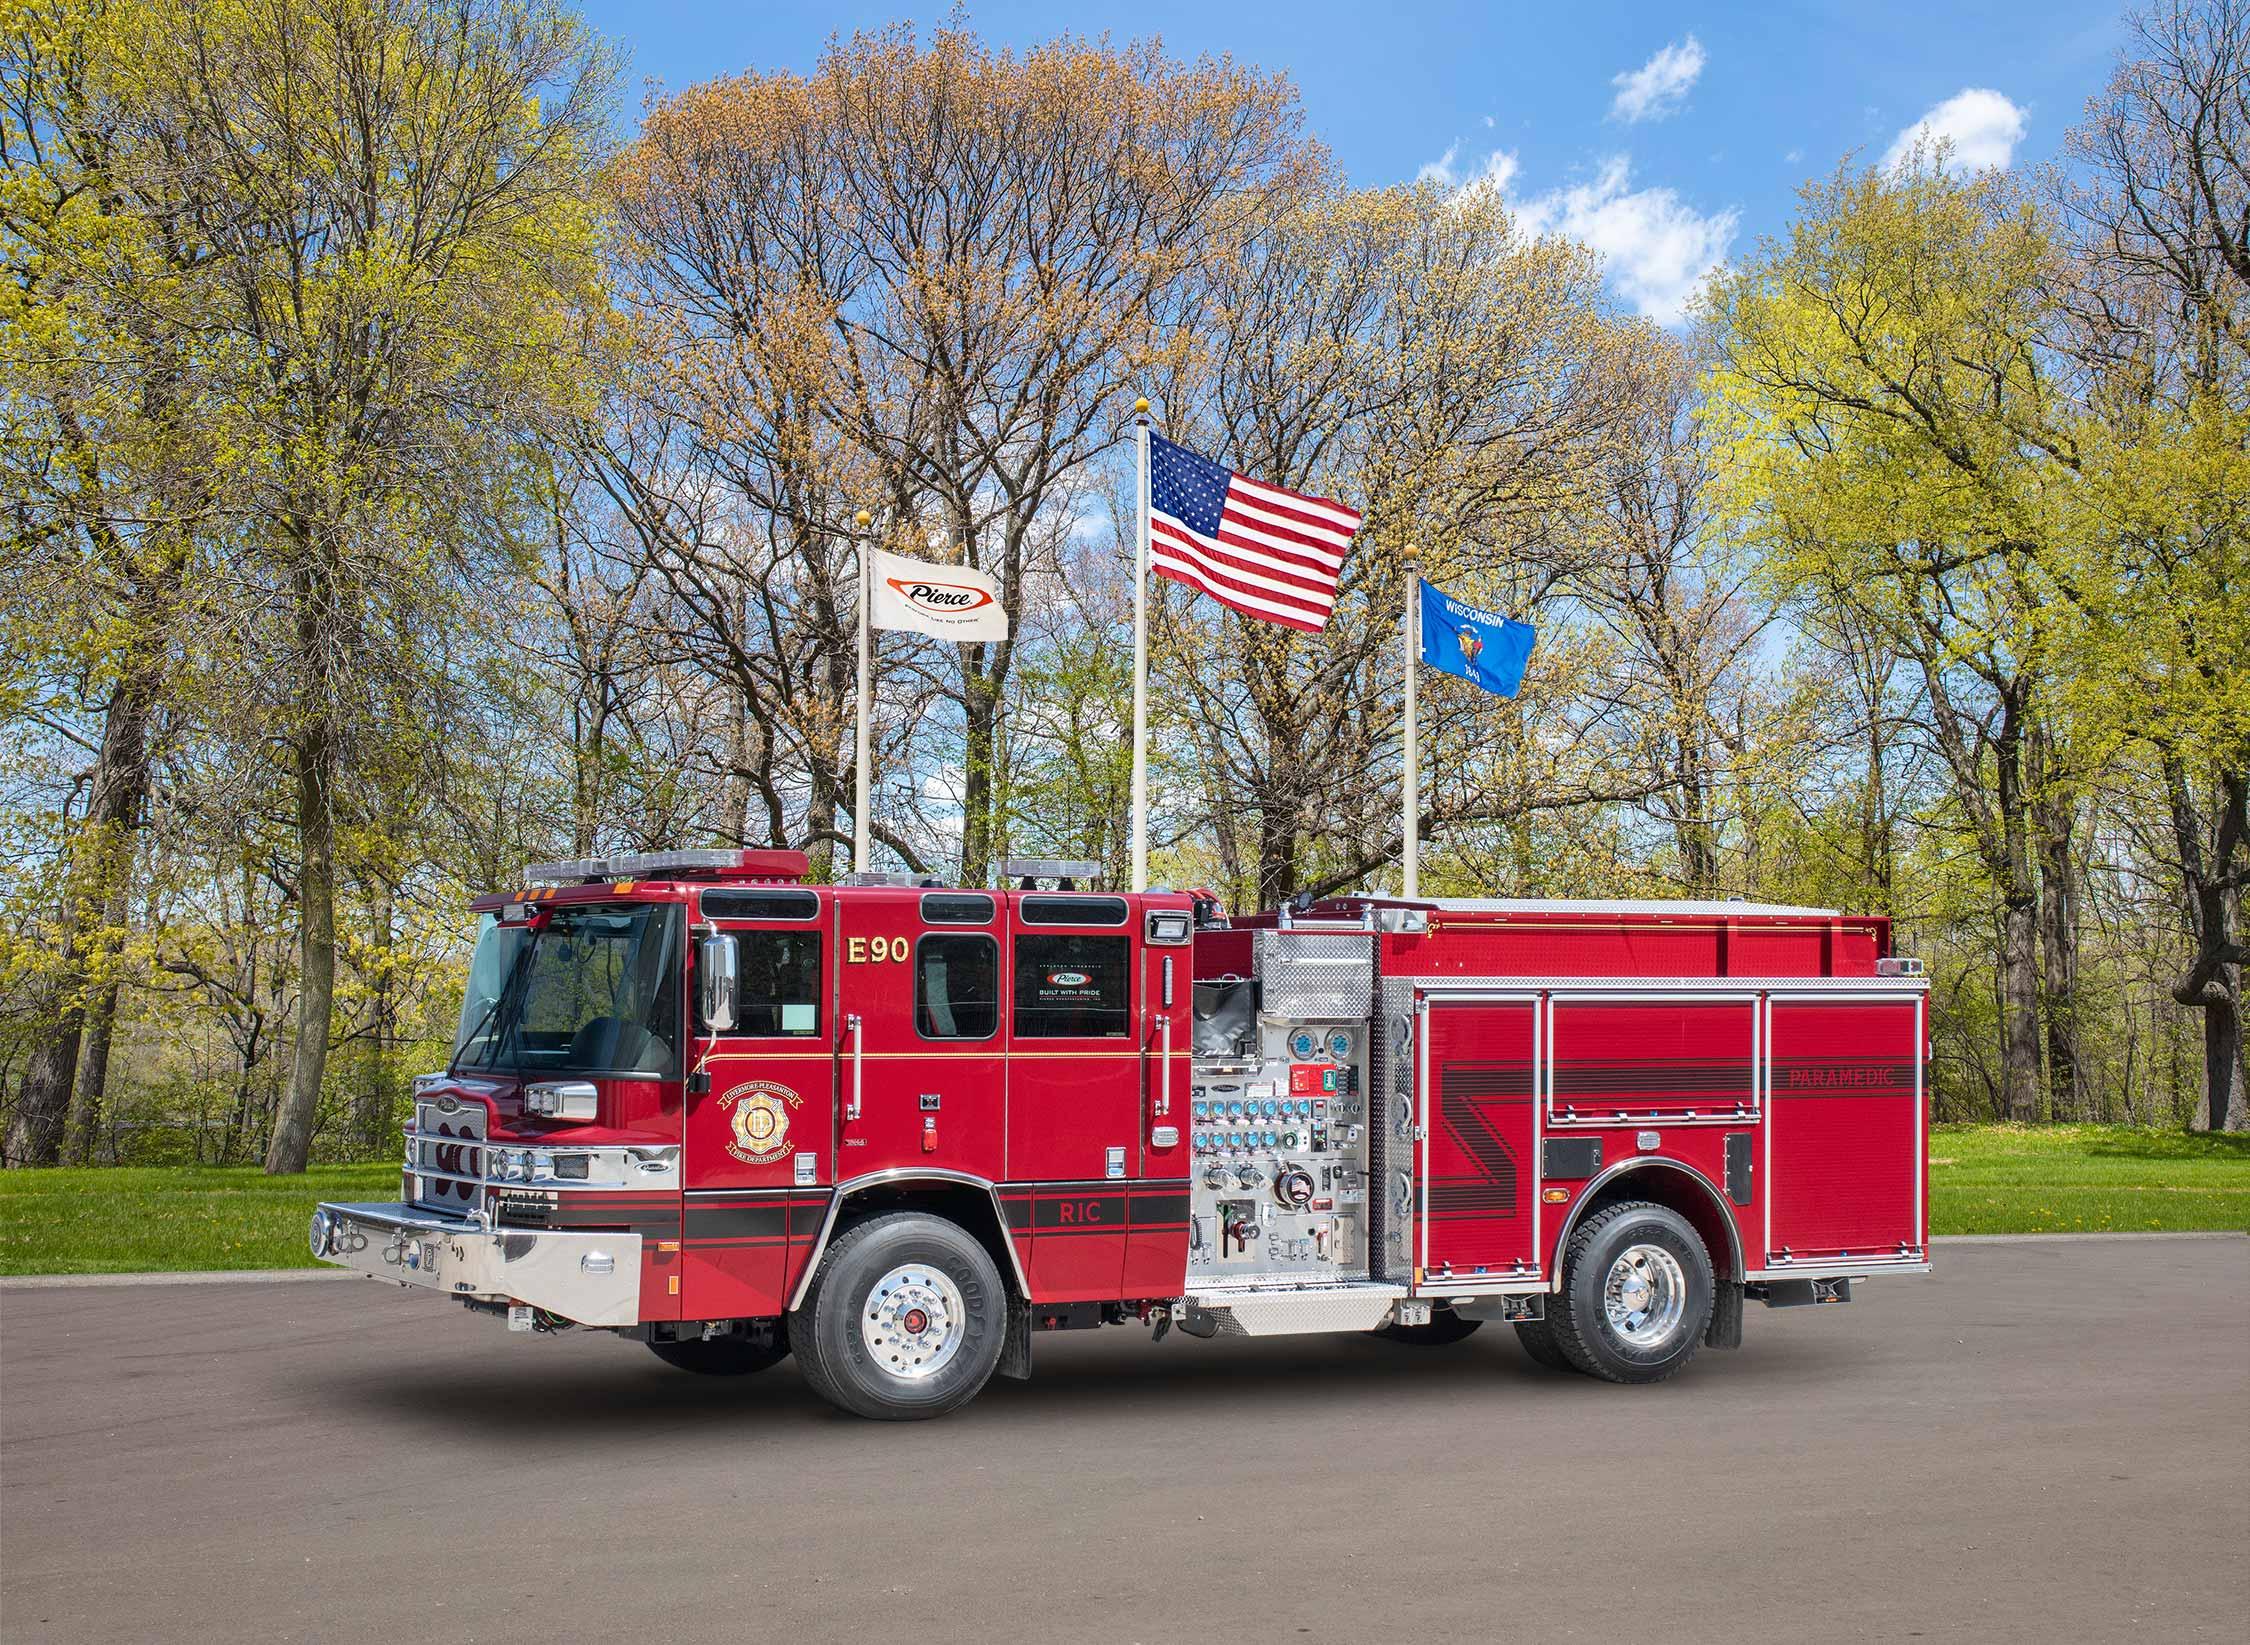 Livermore-Pleasanton Fire Department - Pumper